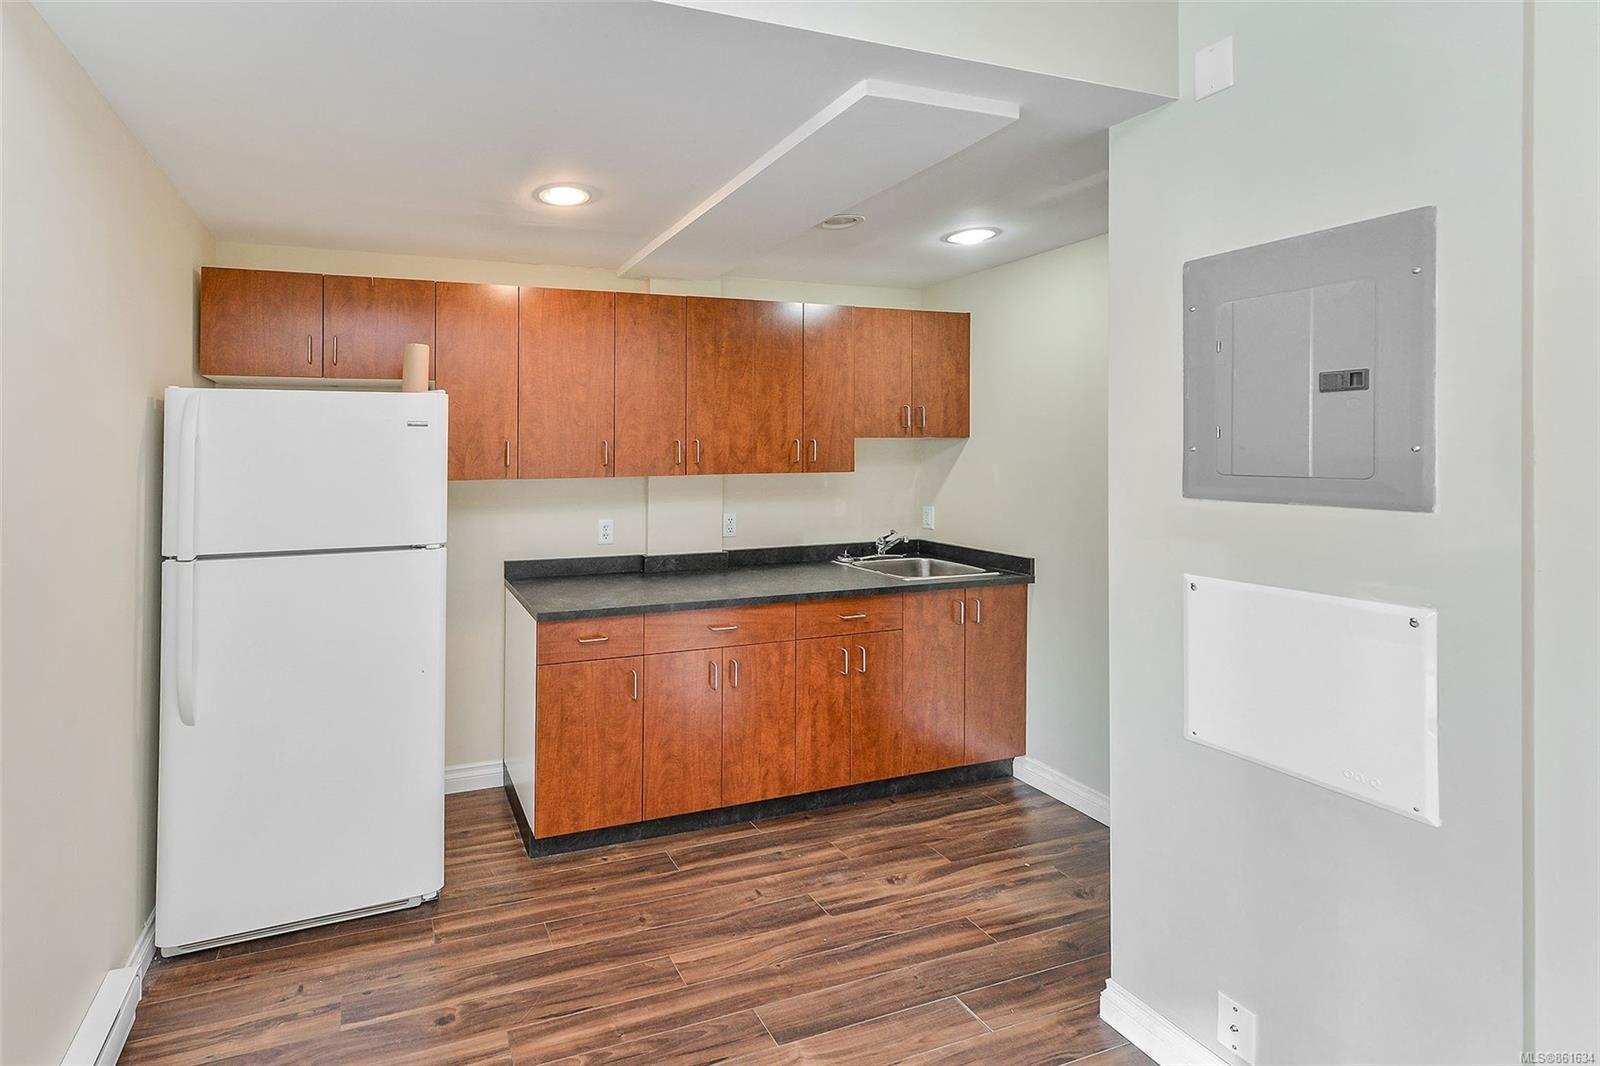 Photo 13: Photos: 367 E Burnside Rd in : Vi Burnside Quadruplex for sale (Victoria)  : MLS®# 861634